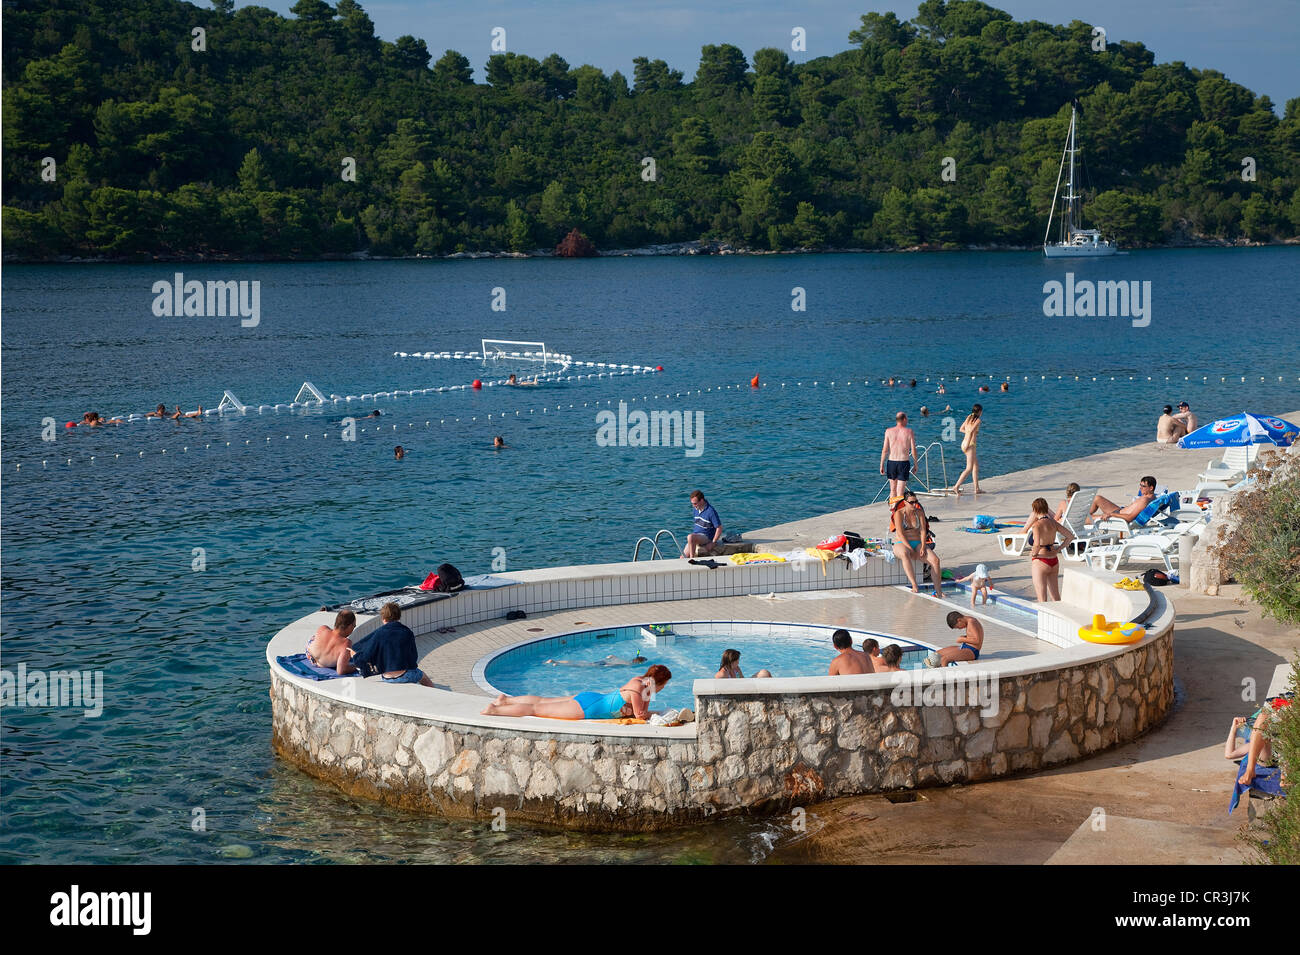 Croatia, Dalmatia, Dalmatian Coast, National Park of Mljet Island, Pomena Harbour - Stock Image